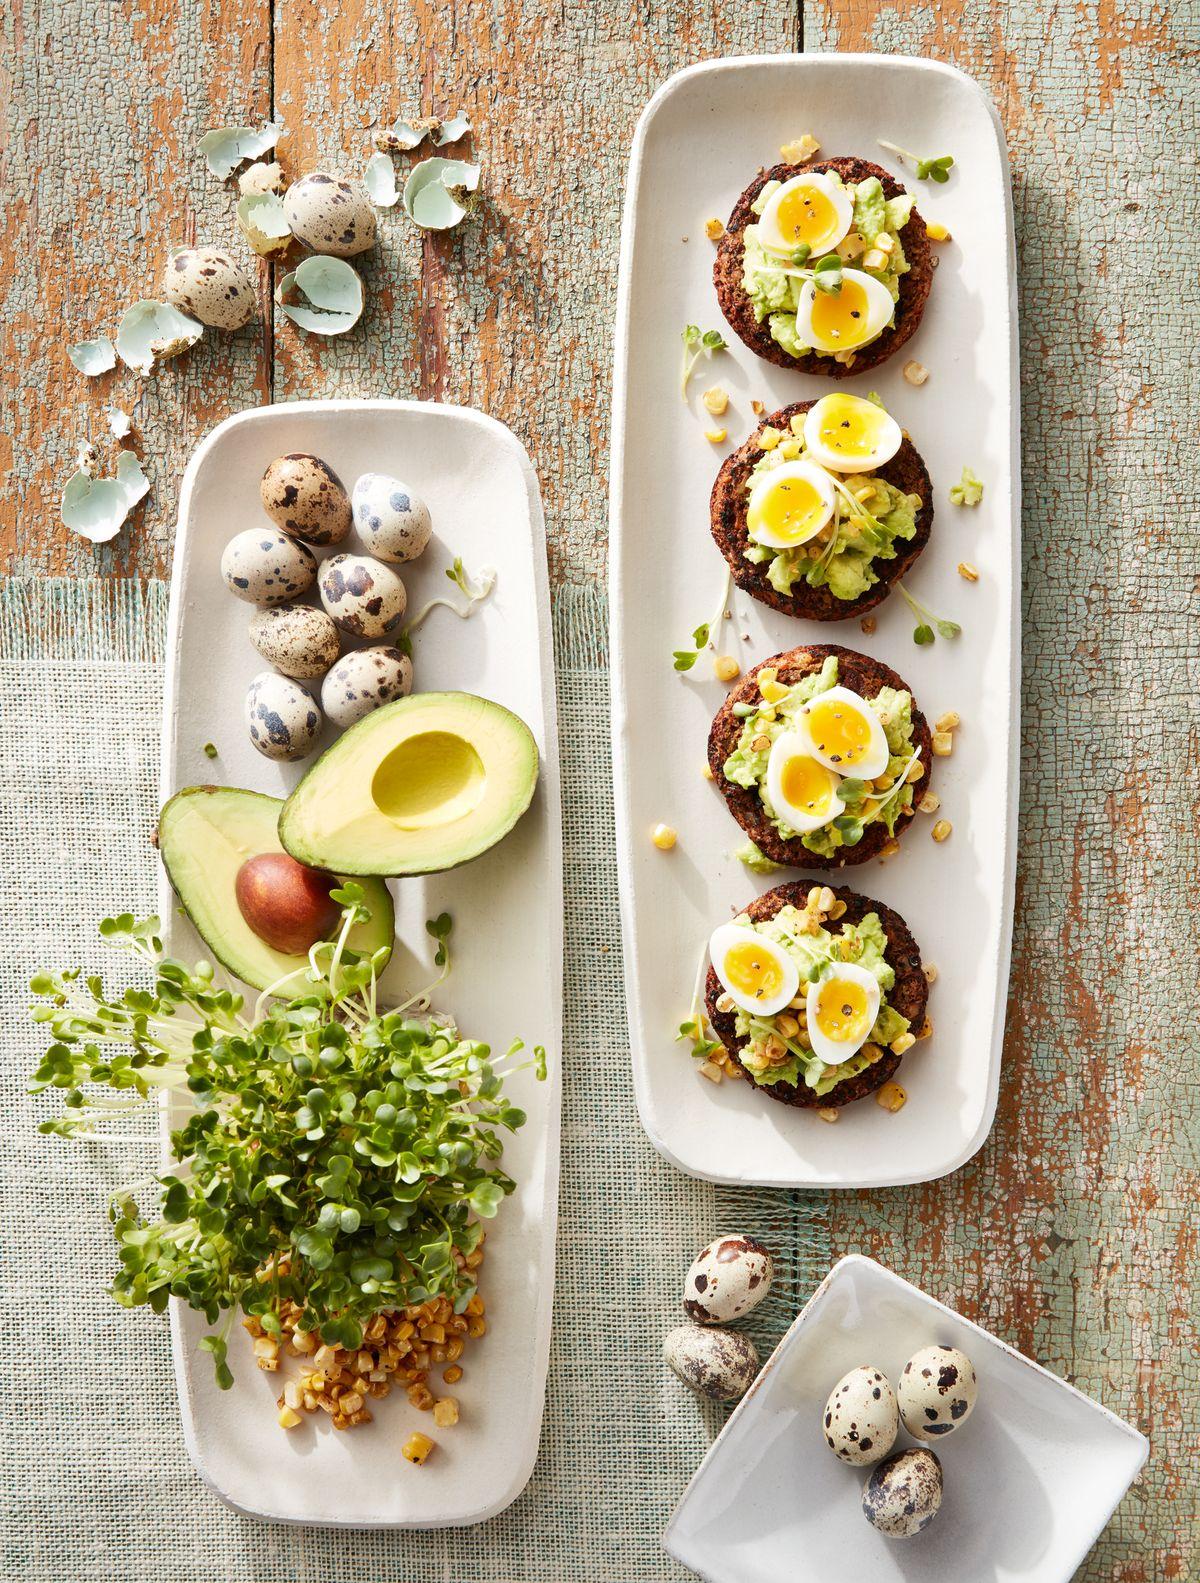 lisa bishop food stylist- avocado toast with quails eggs